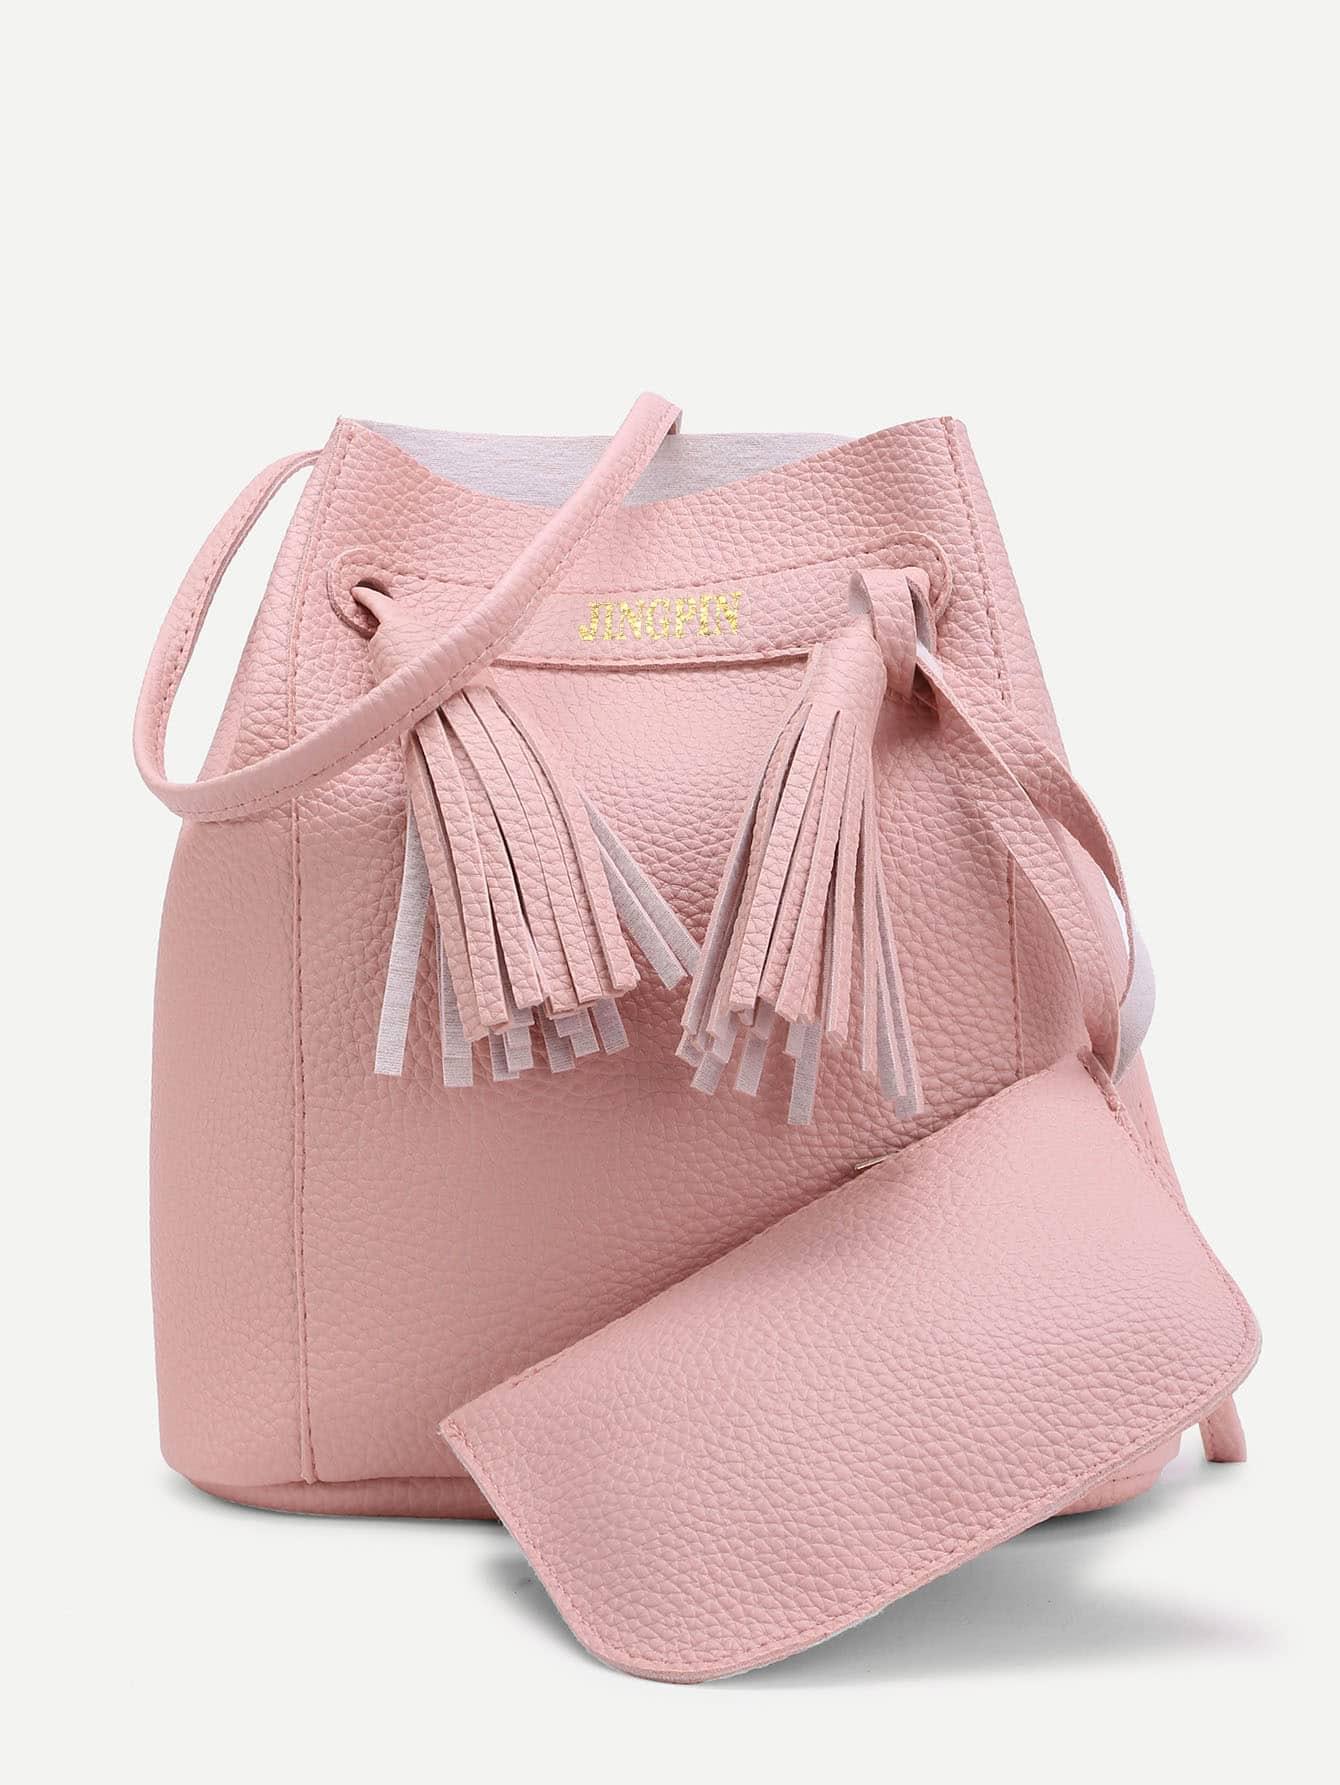 Купить со скидкой Tassel Detail Shoulder Bag With Pouch